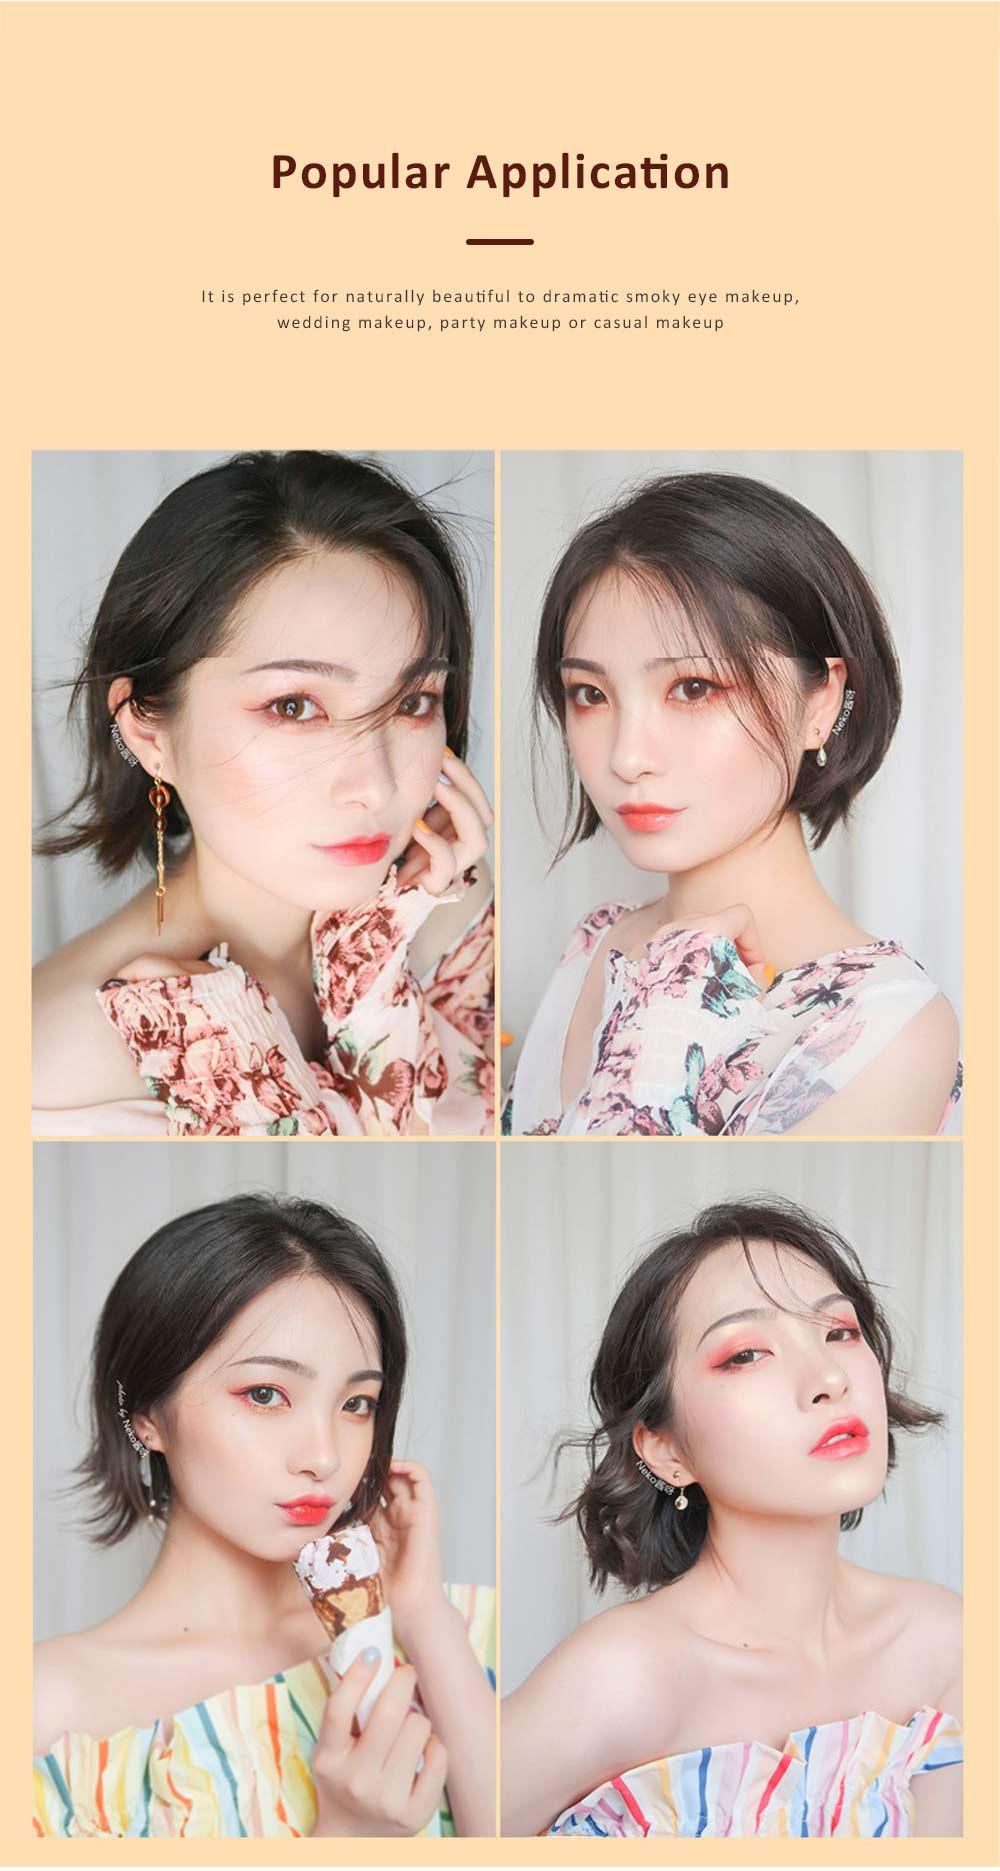 Compact Eyeshadow Palette Matte Waterproof 5 Colors Eye Makeup Natural Smoky Eye Shadow Cosmetic 3